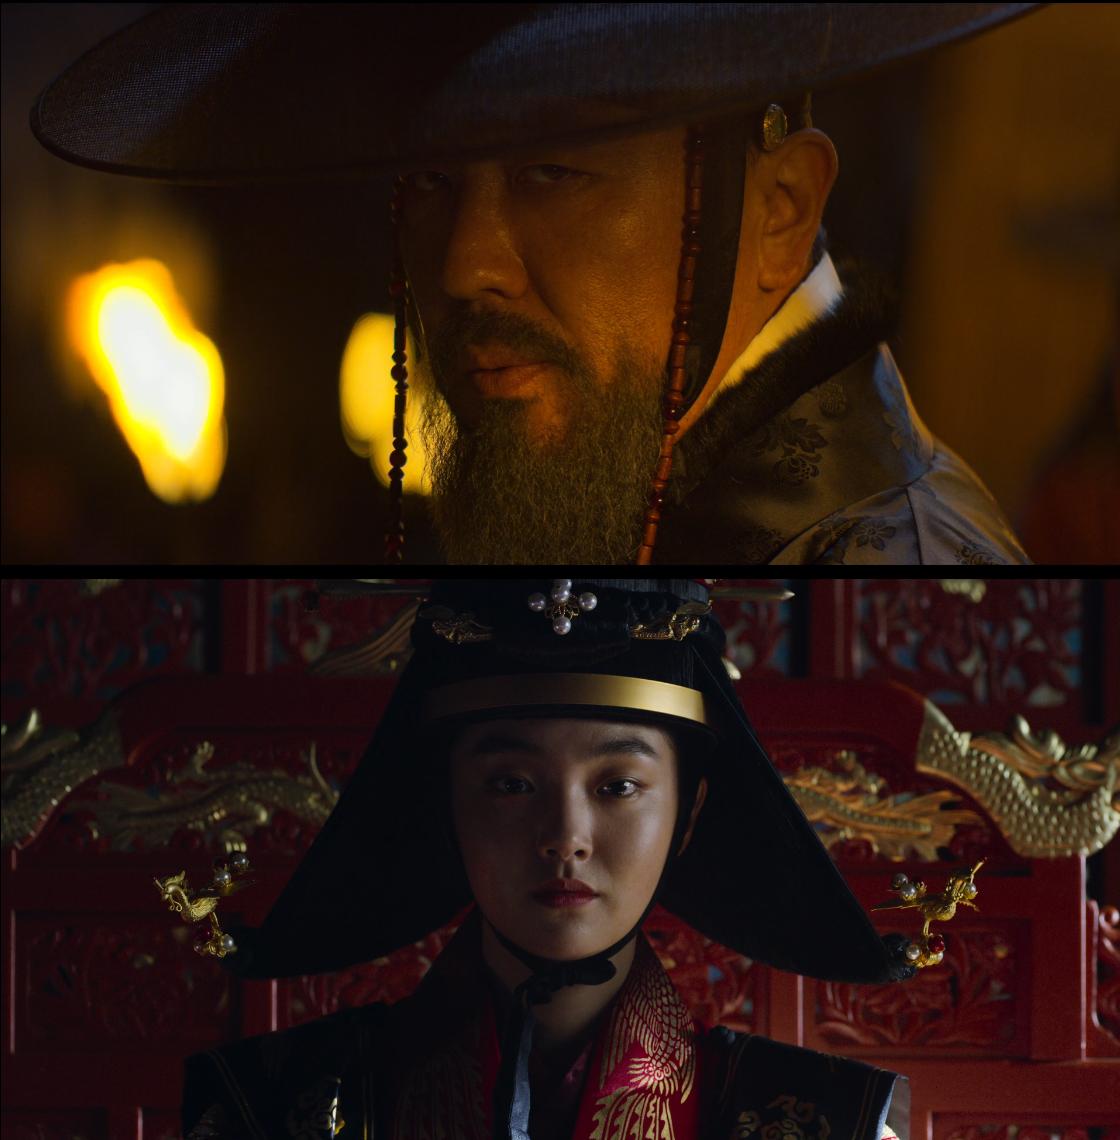 kingdom_kep3_cho_fotanacsos_ryu_seung-ryong_es_lanya_a_kiralyne_kim_hye-jun_tovabb_szovogetik_ordogi_tervuket.png